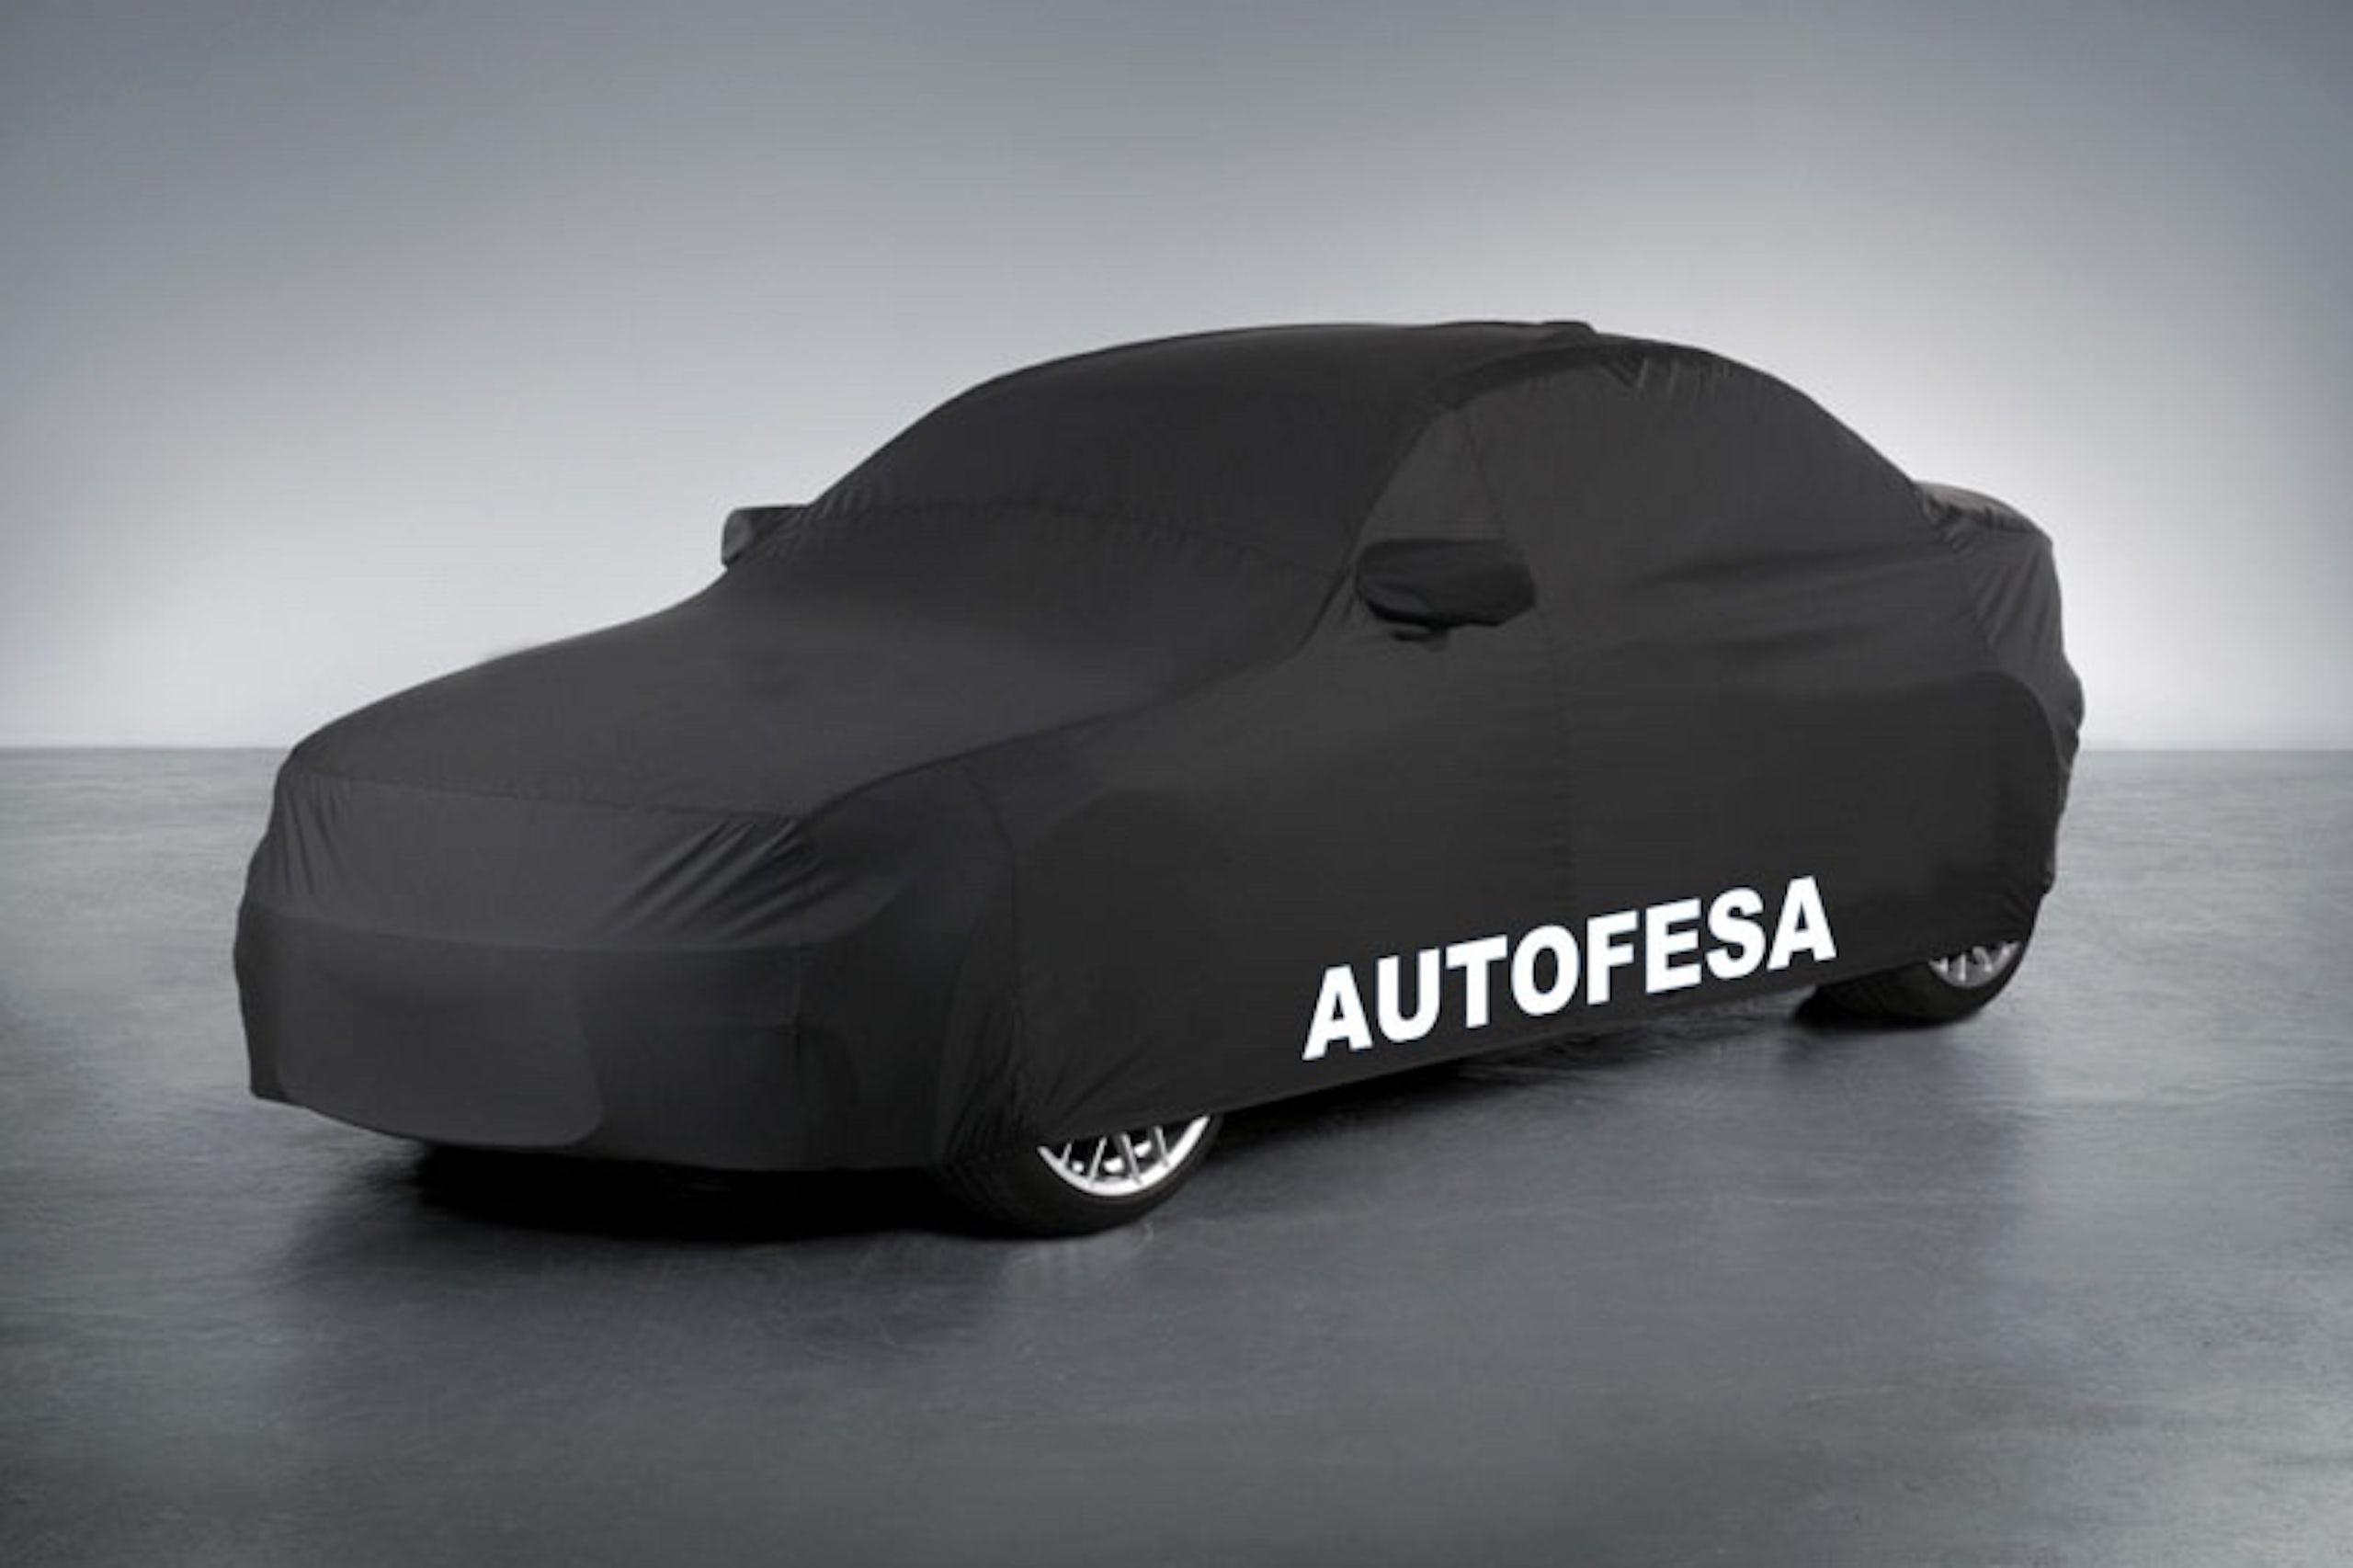 Audi A6 A6Avant COMPETITION ABT 3.0 TDI V6 T 326cv quattro 5p S tronic 4x4 Cpmpetition ABT S/S - Foto 3